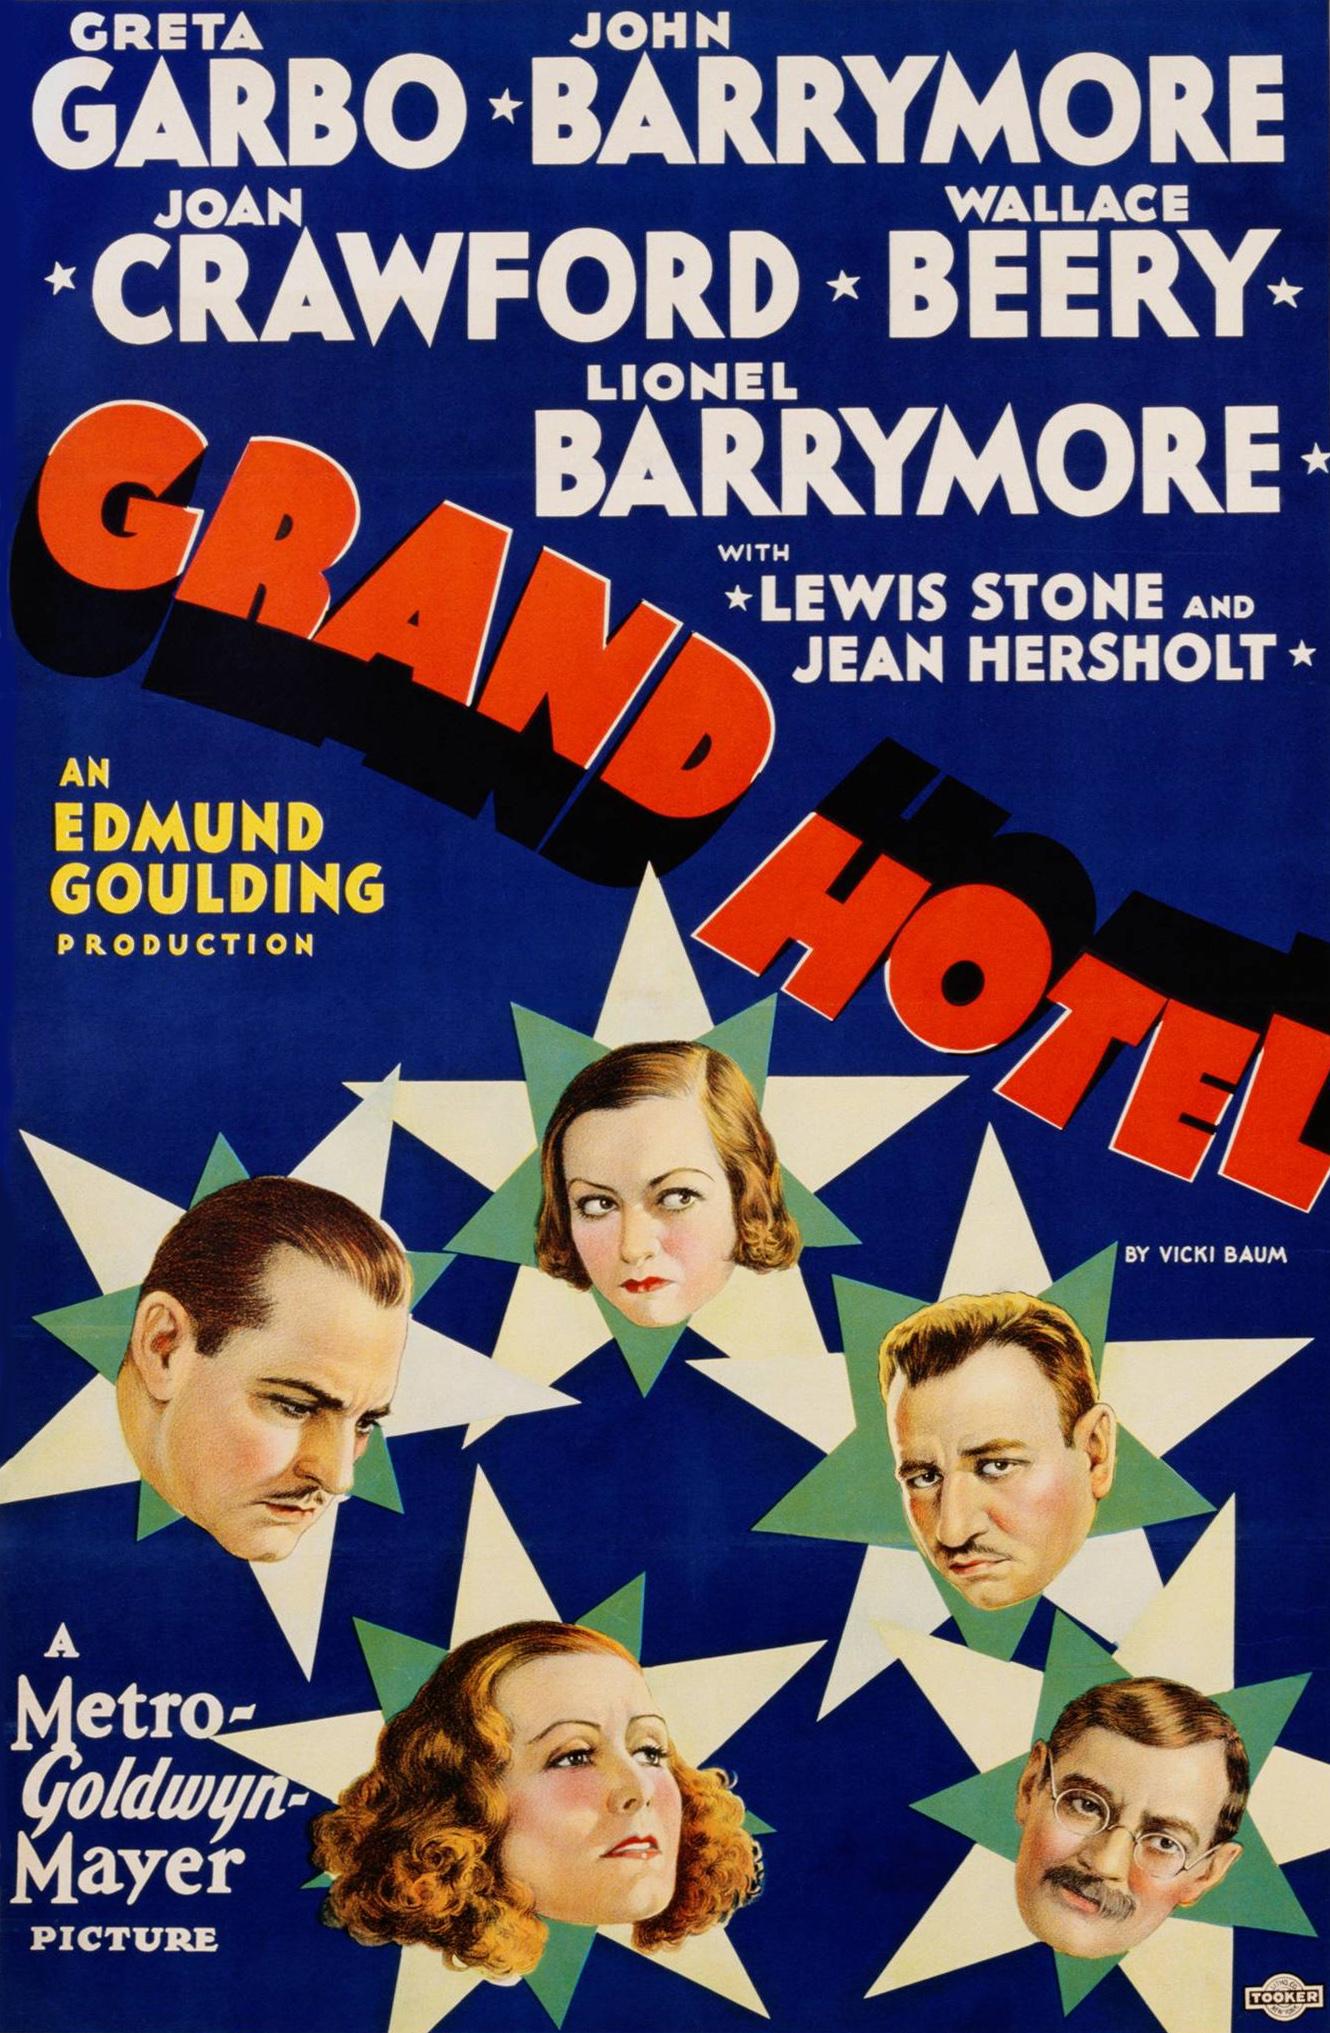 Grande Hotel, de Edmund Goulding